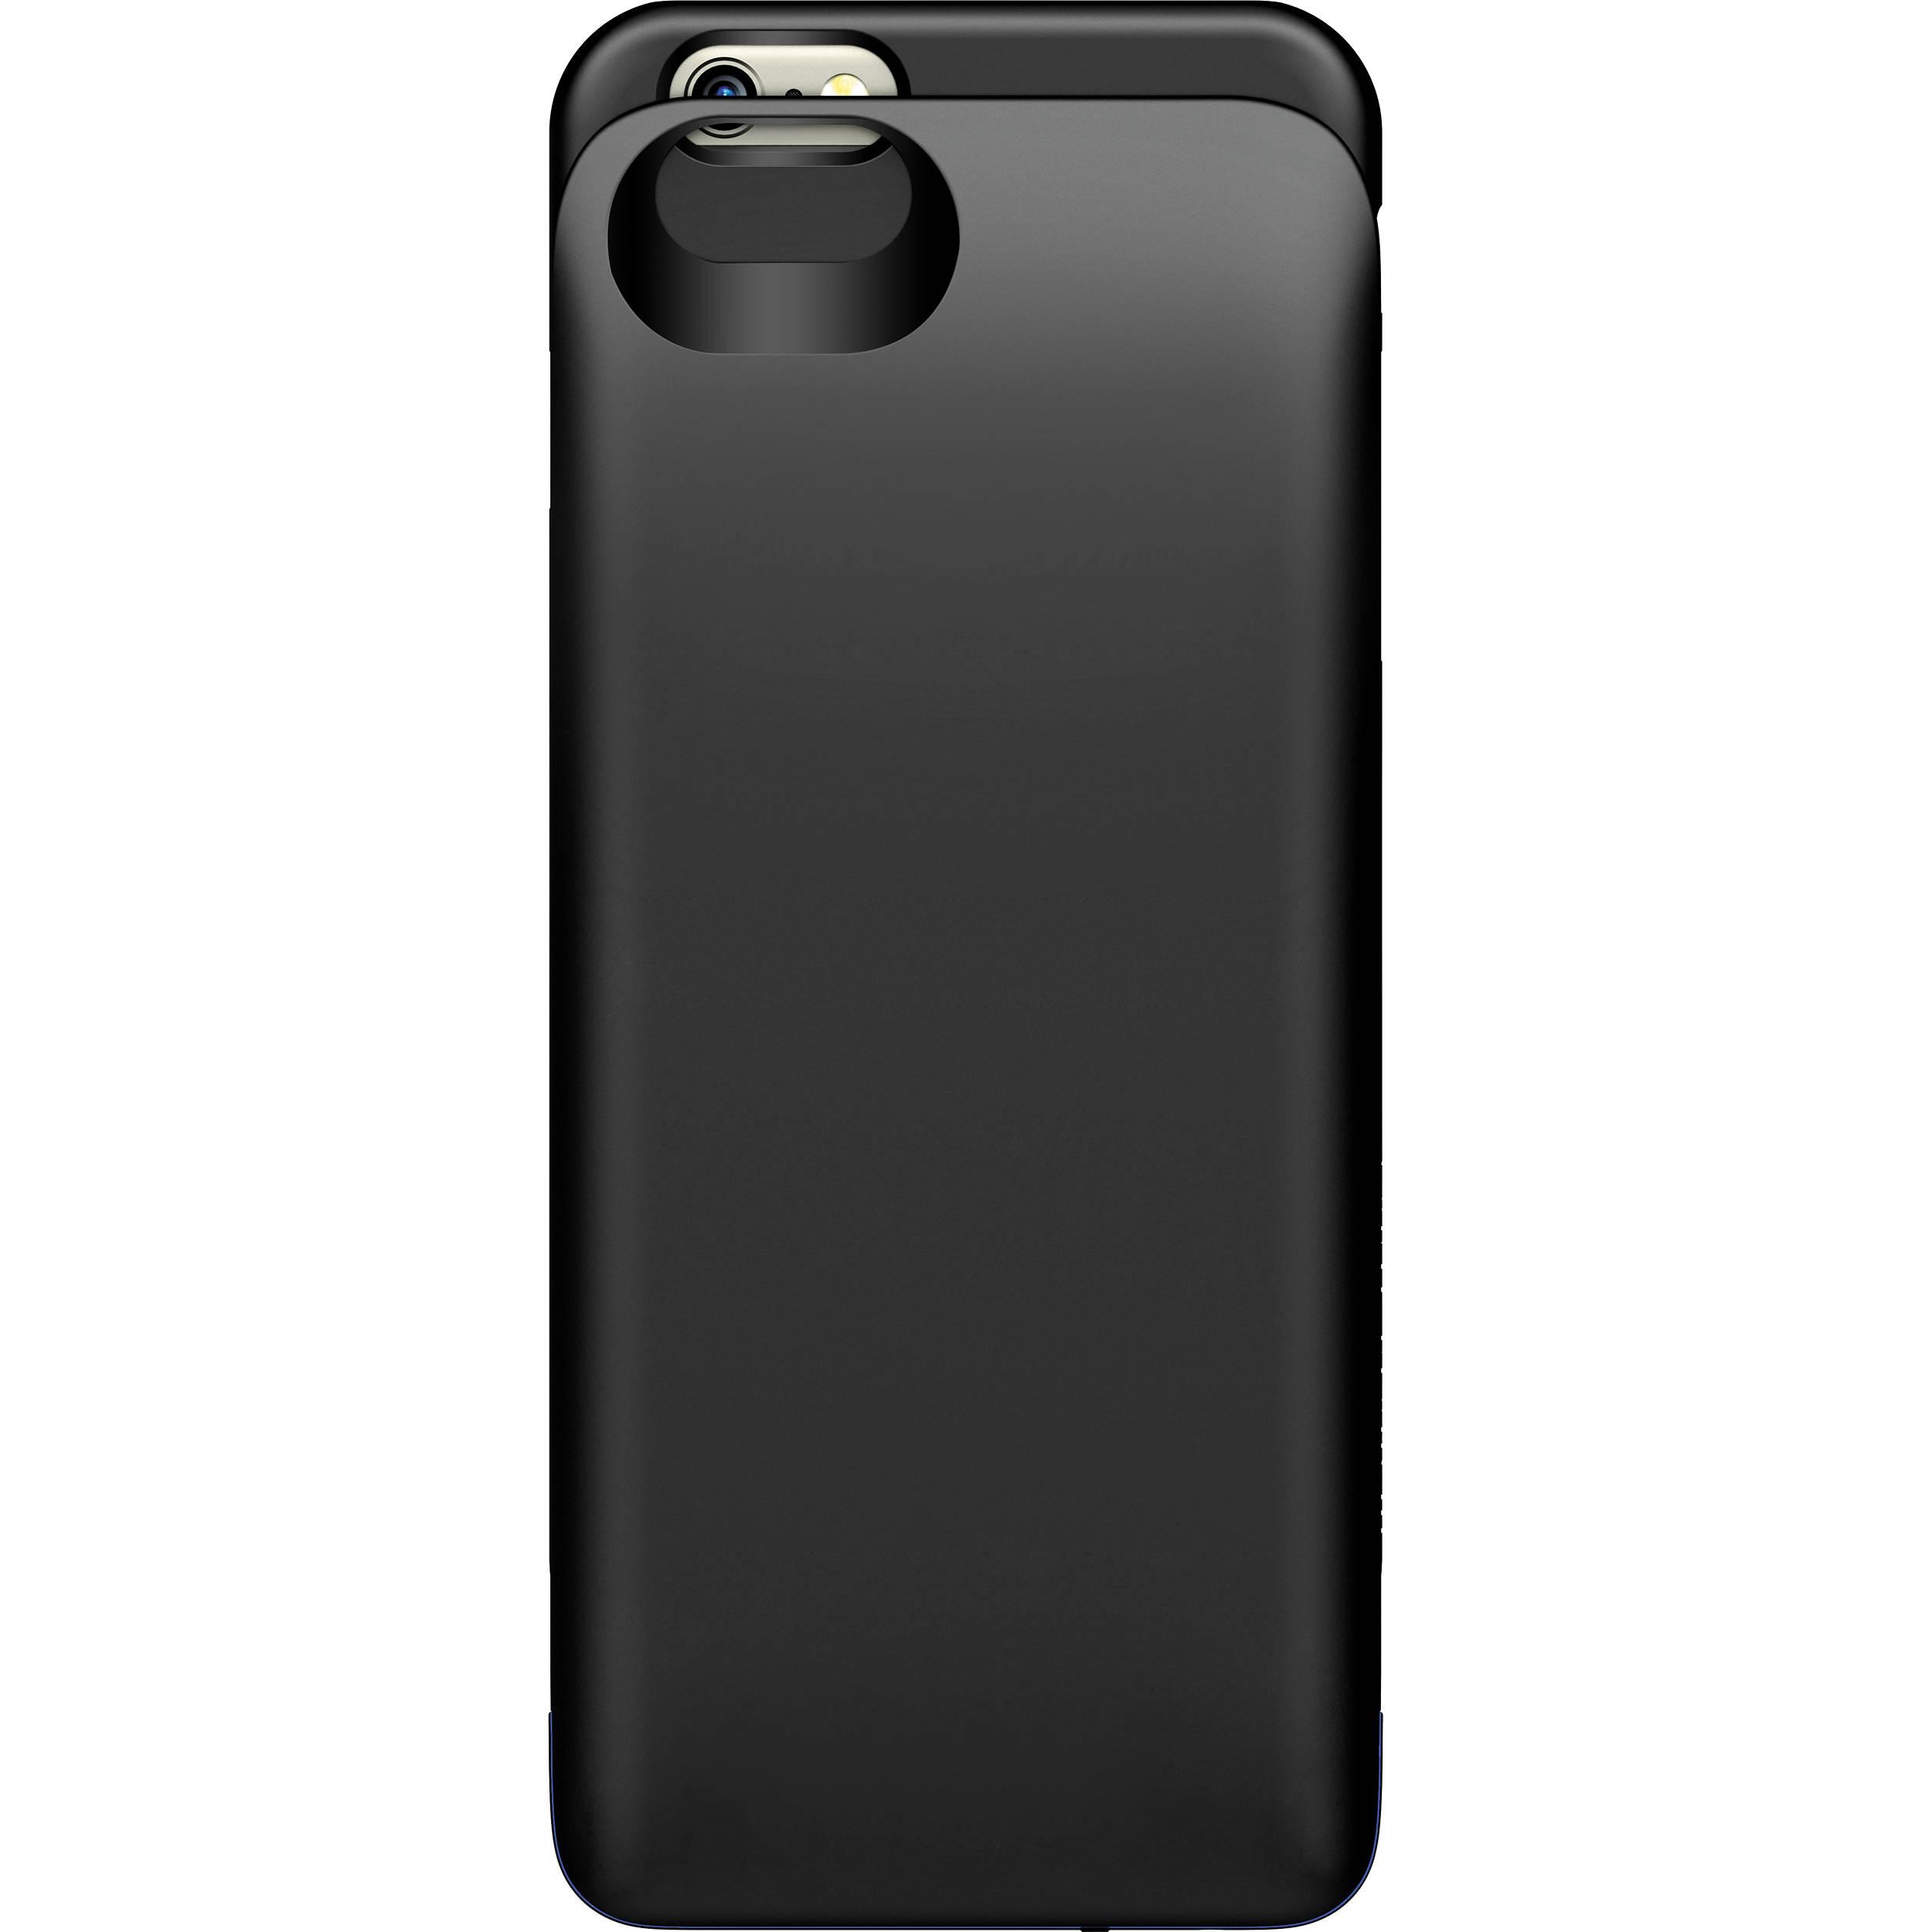 boostcase hybrid power case for iphone 6 6s bch2200ip6 blk b h. Black Bedroom Furniture Sets. Home Design Ideas